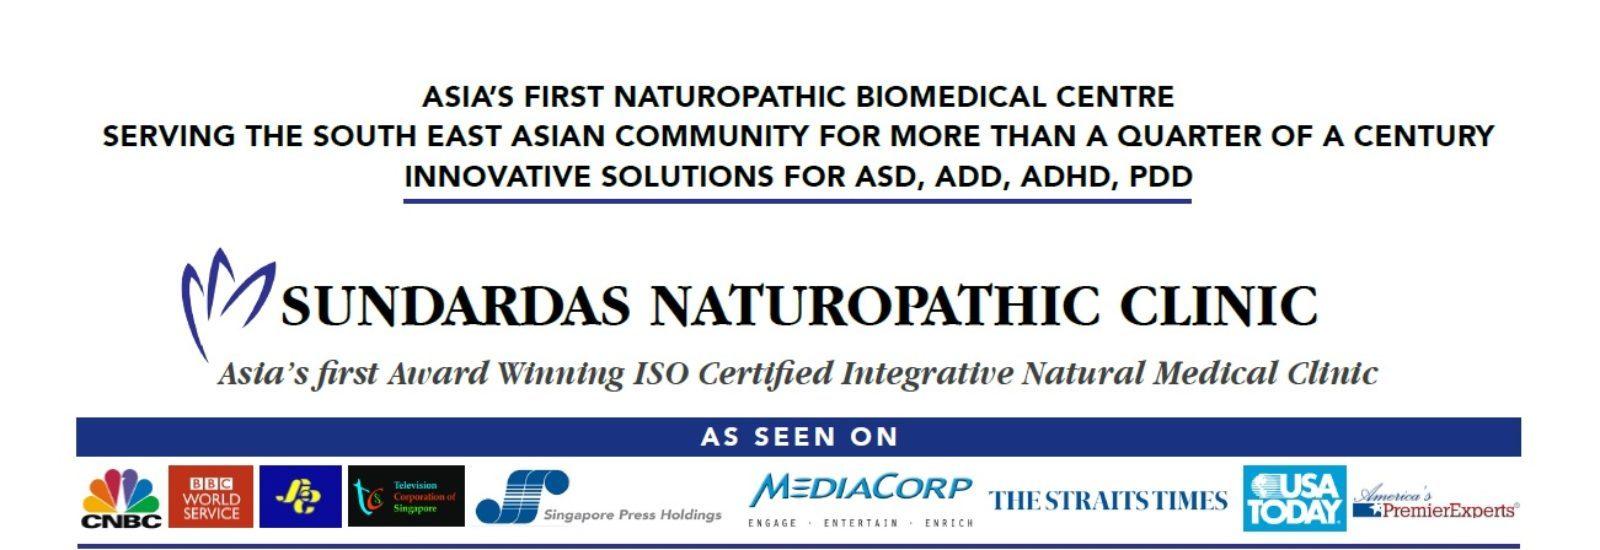 Autism Singapore – Sundardas Naturopathic Clinic